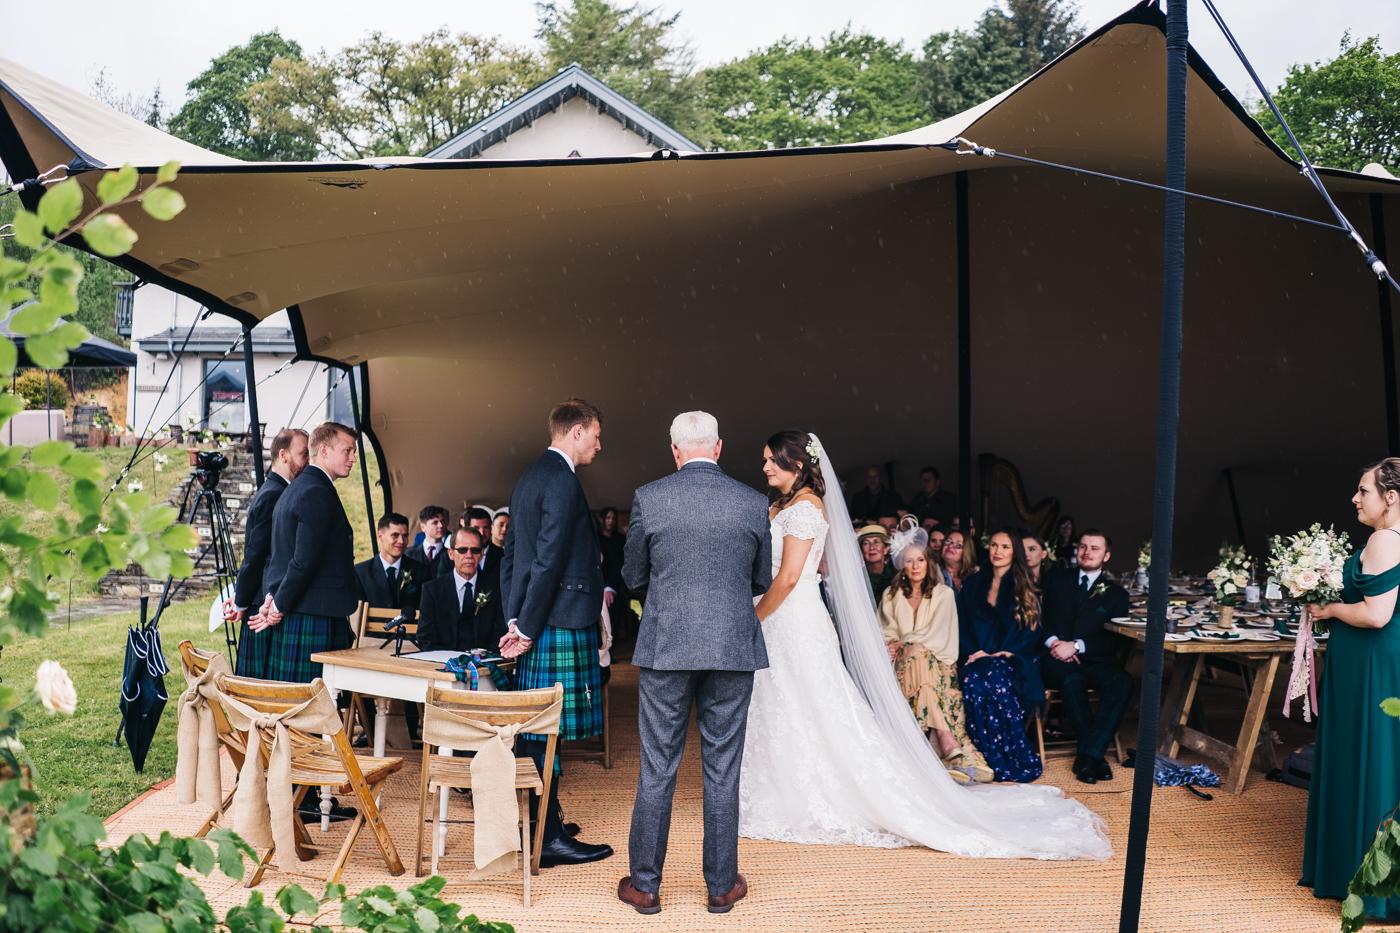 scottish-wedding-trossachs-loch-tay-highlannds-relaxed-photography-photographer-0017.jpg